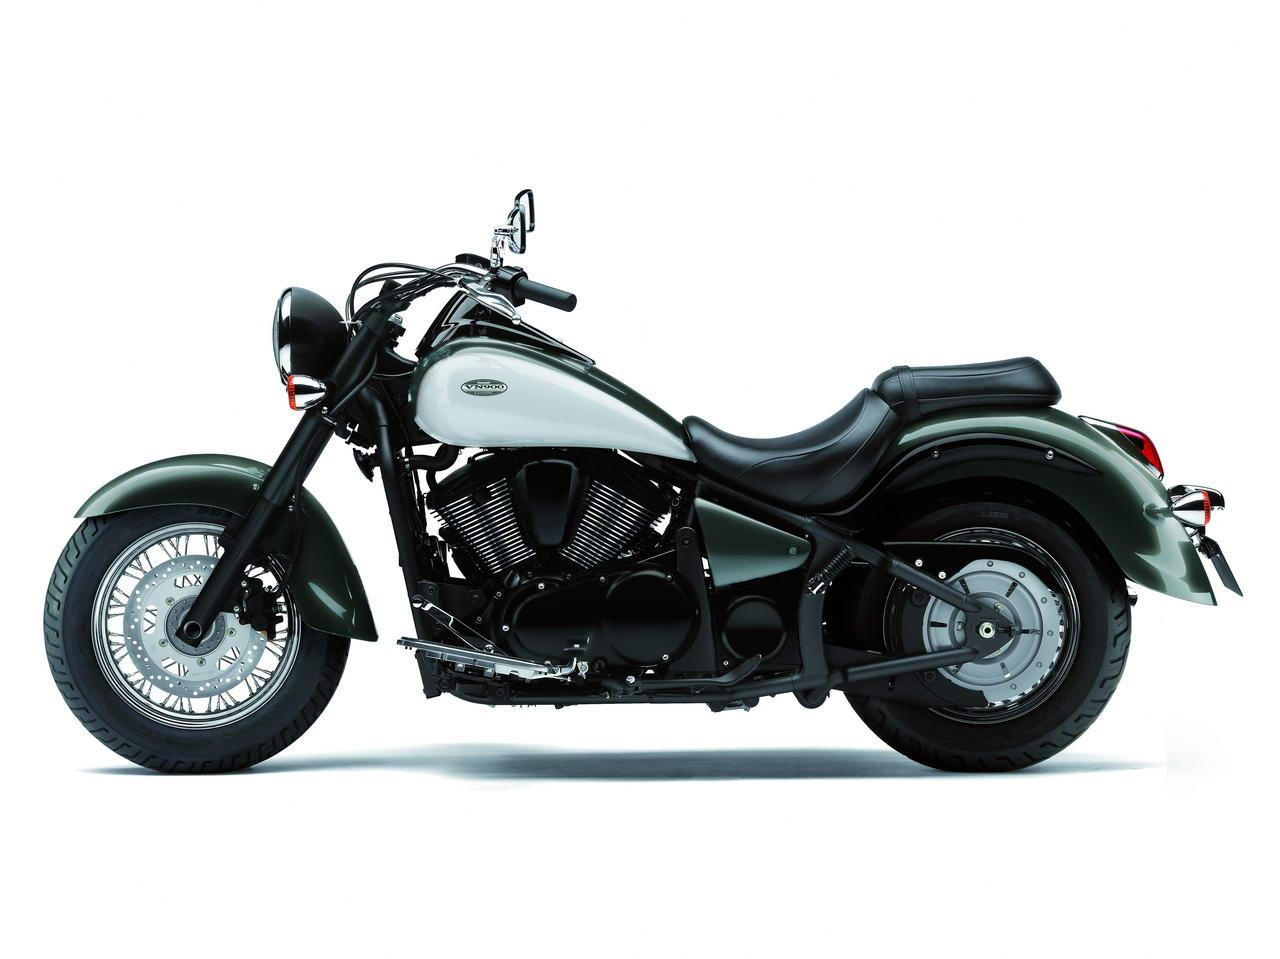 Listino Kawasaki VN 900 Classic Special Custom e Cruiser - image 15535_kawasaki-vn900-classic-special on http://moto.motori.net